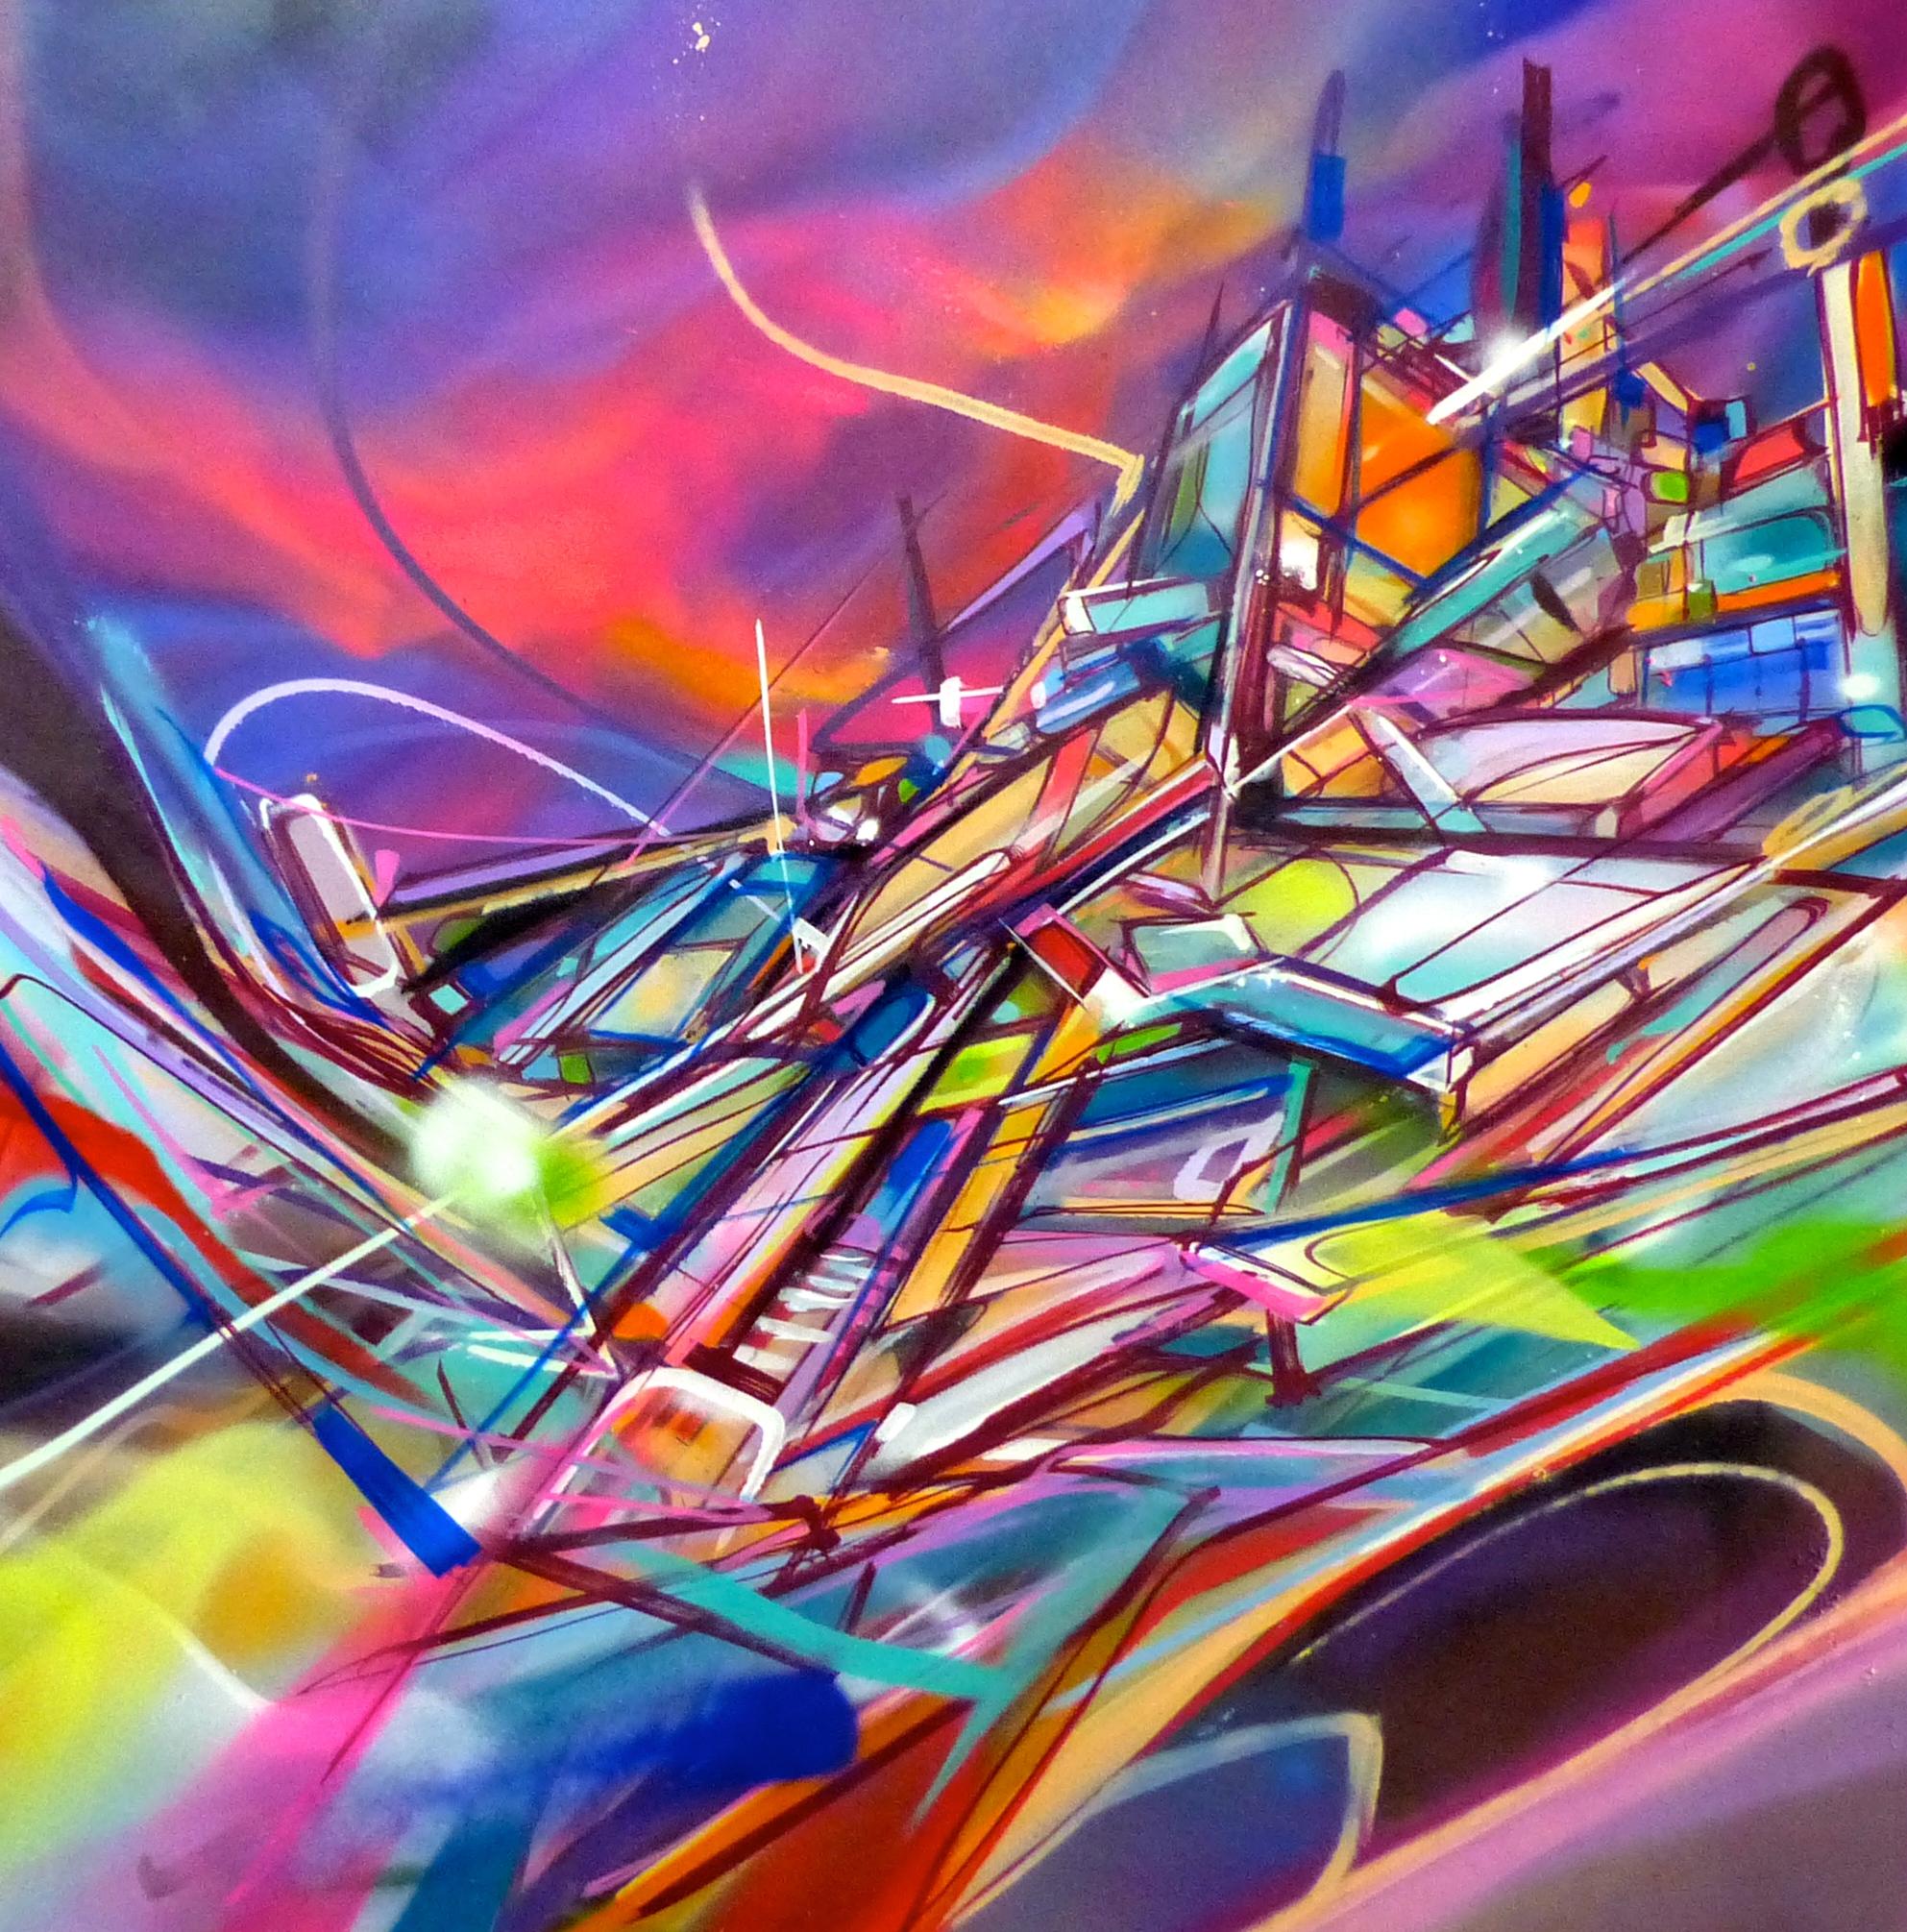 Tableau Architecture Constructiviste Post Graffiti Nadib Bandi Art Peinture